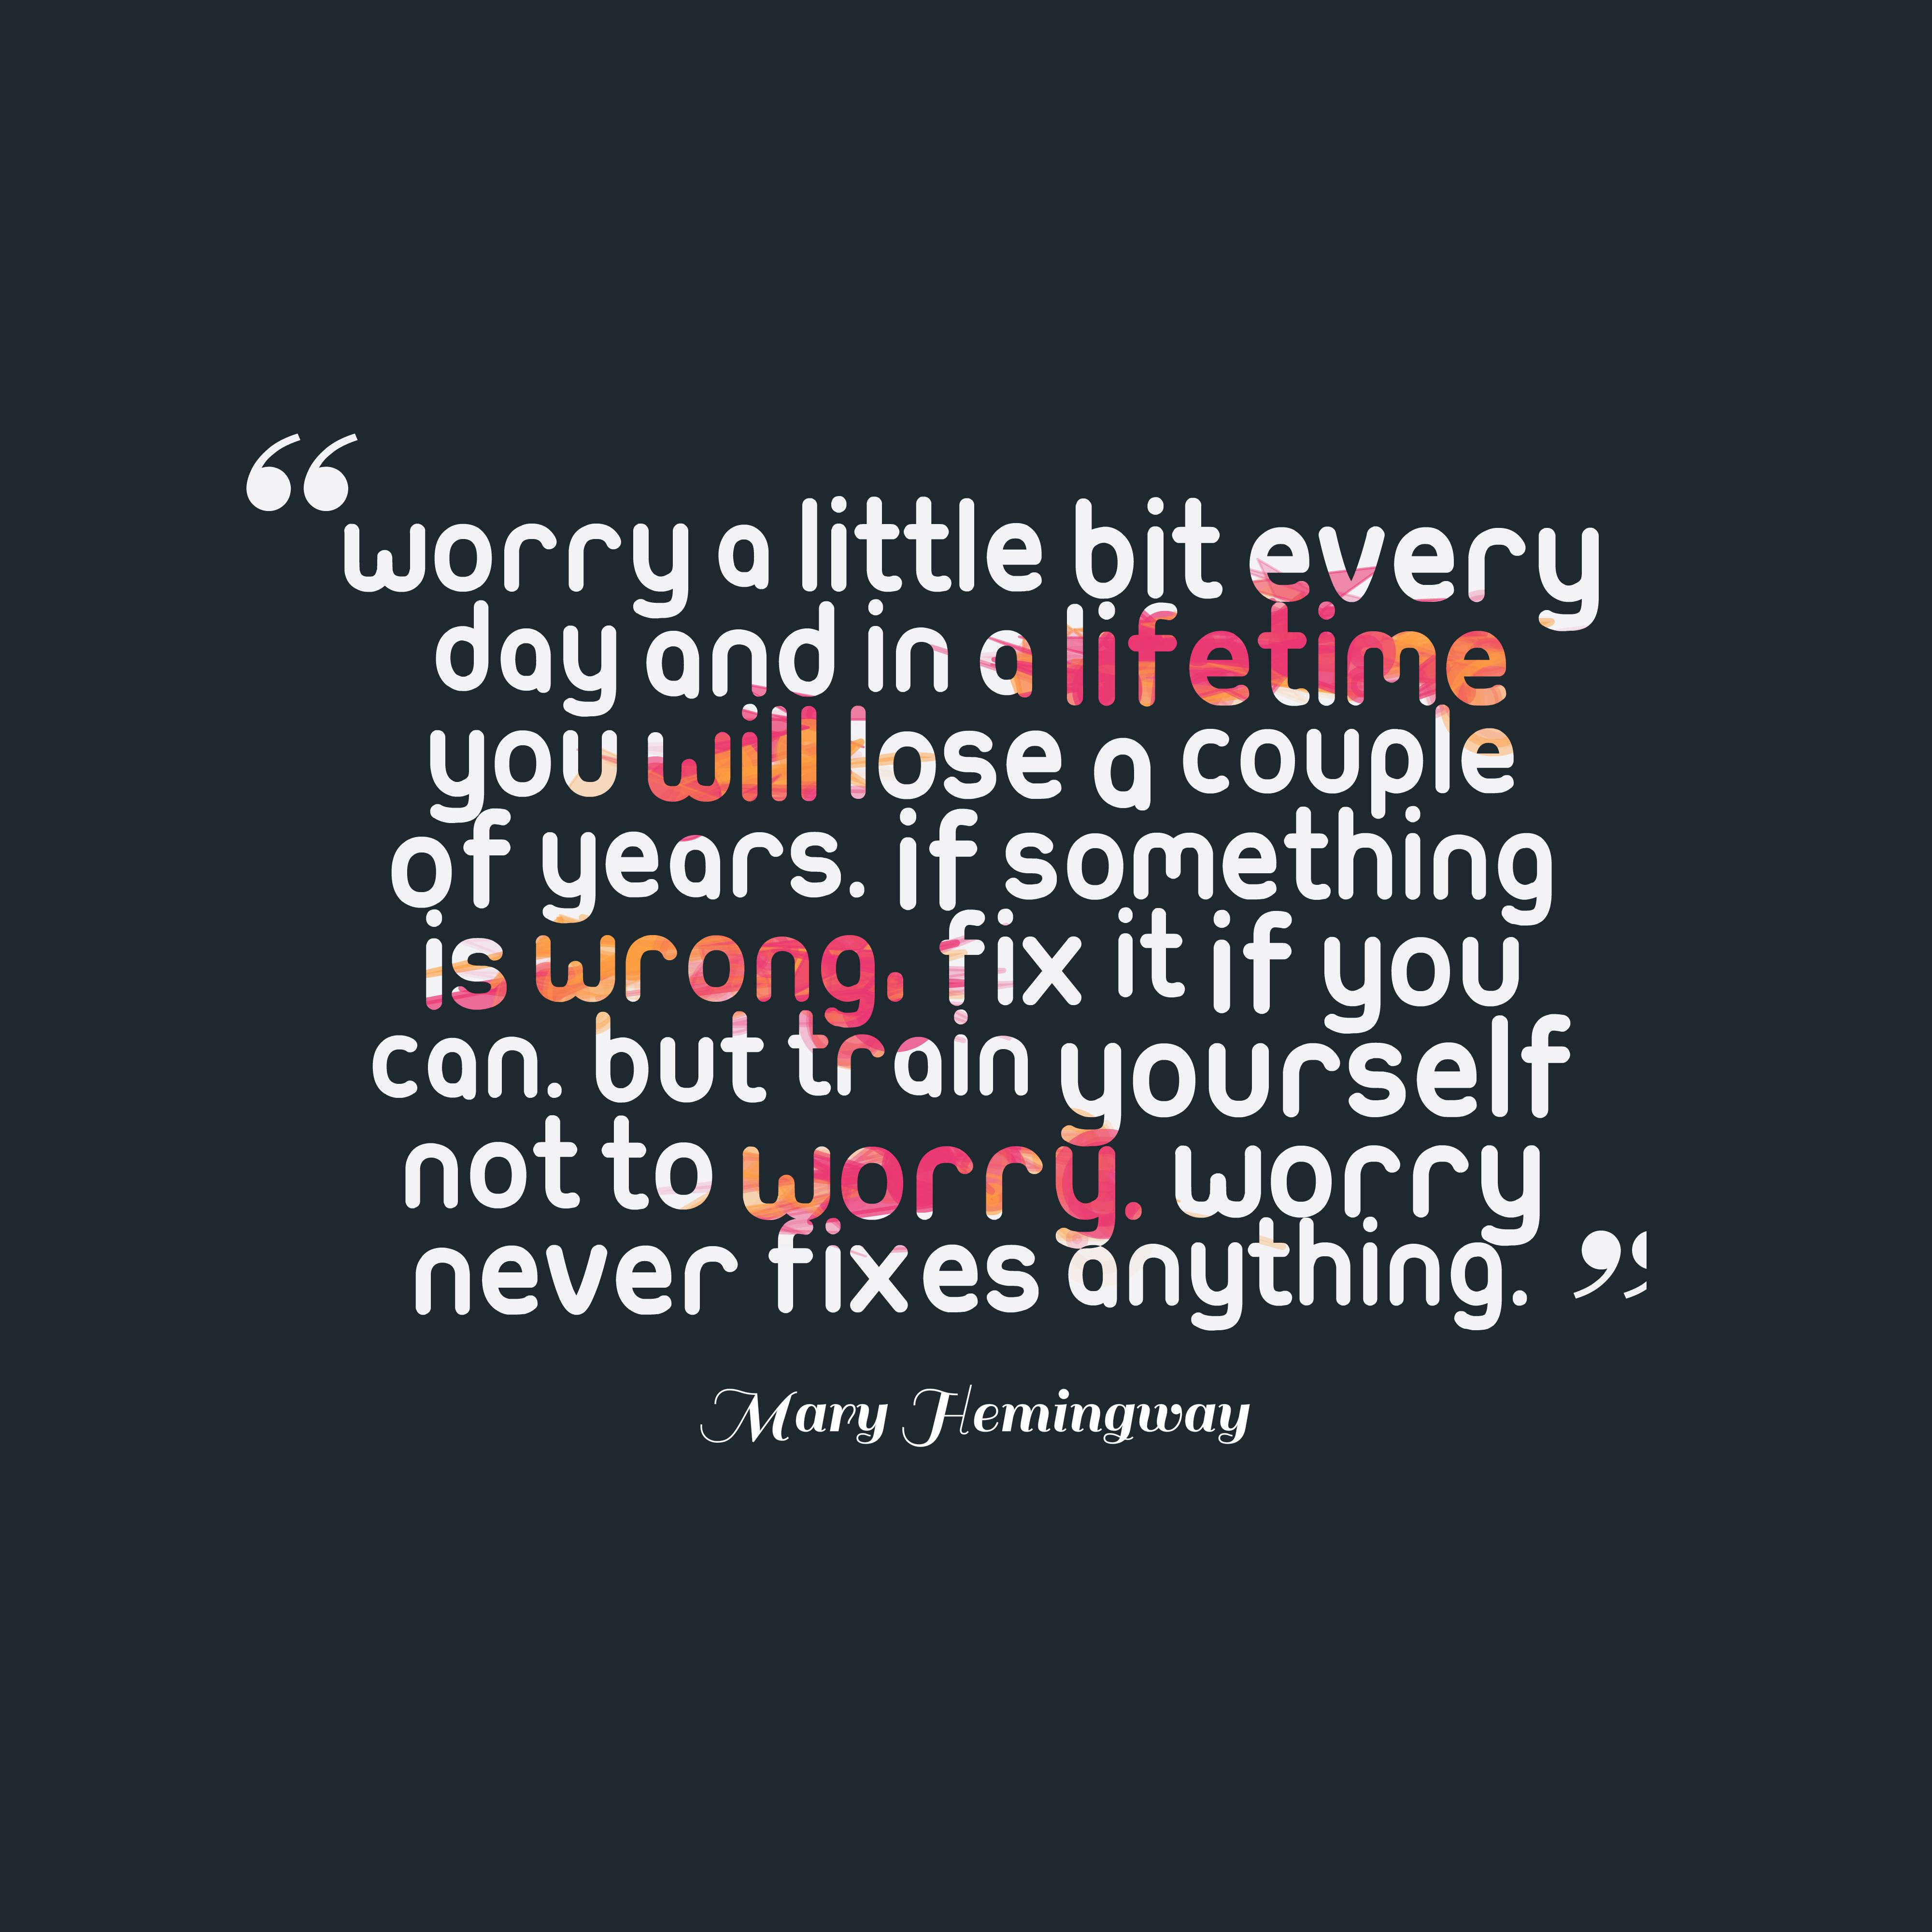 Worry a little